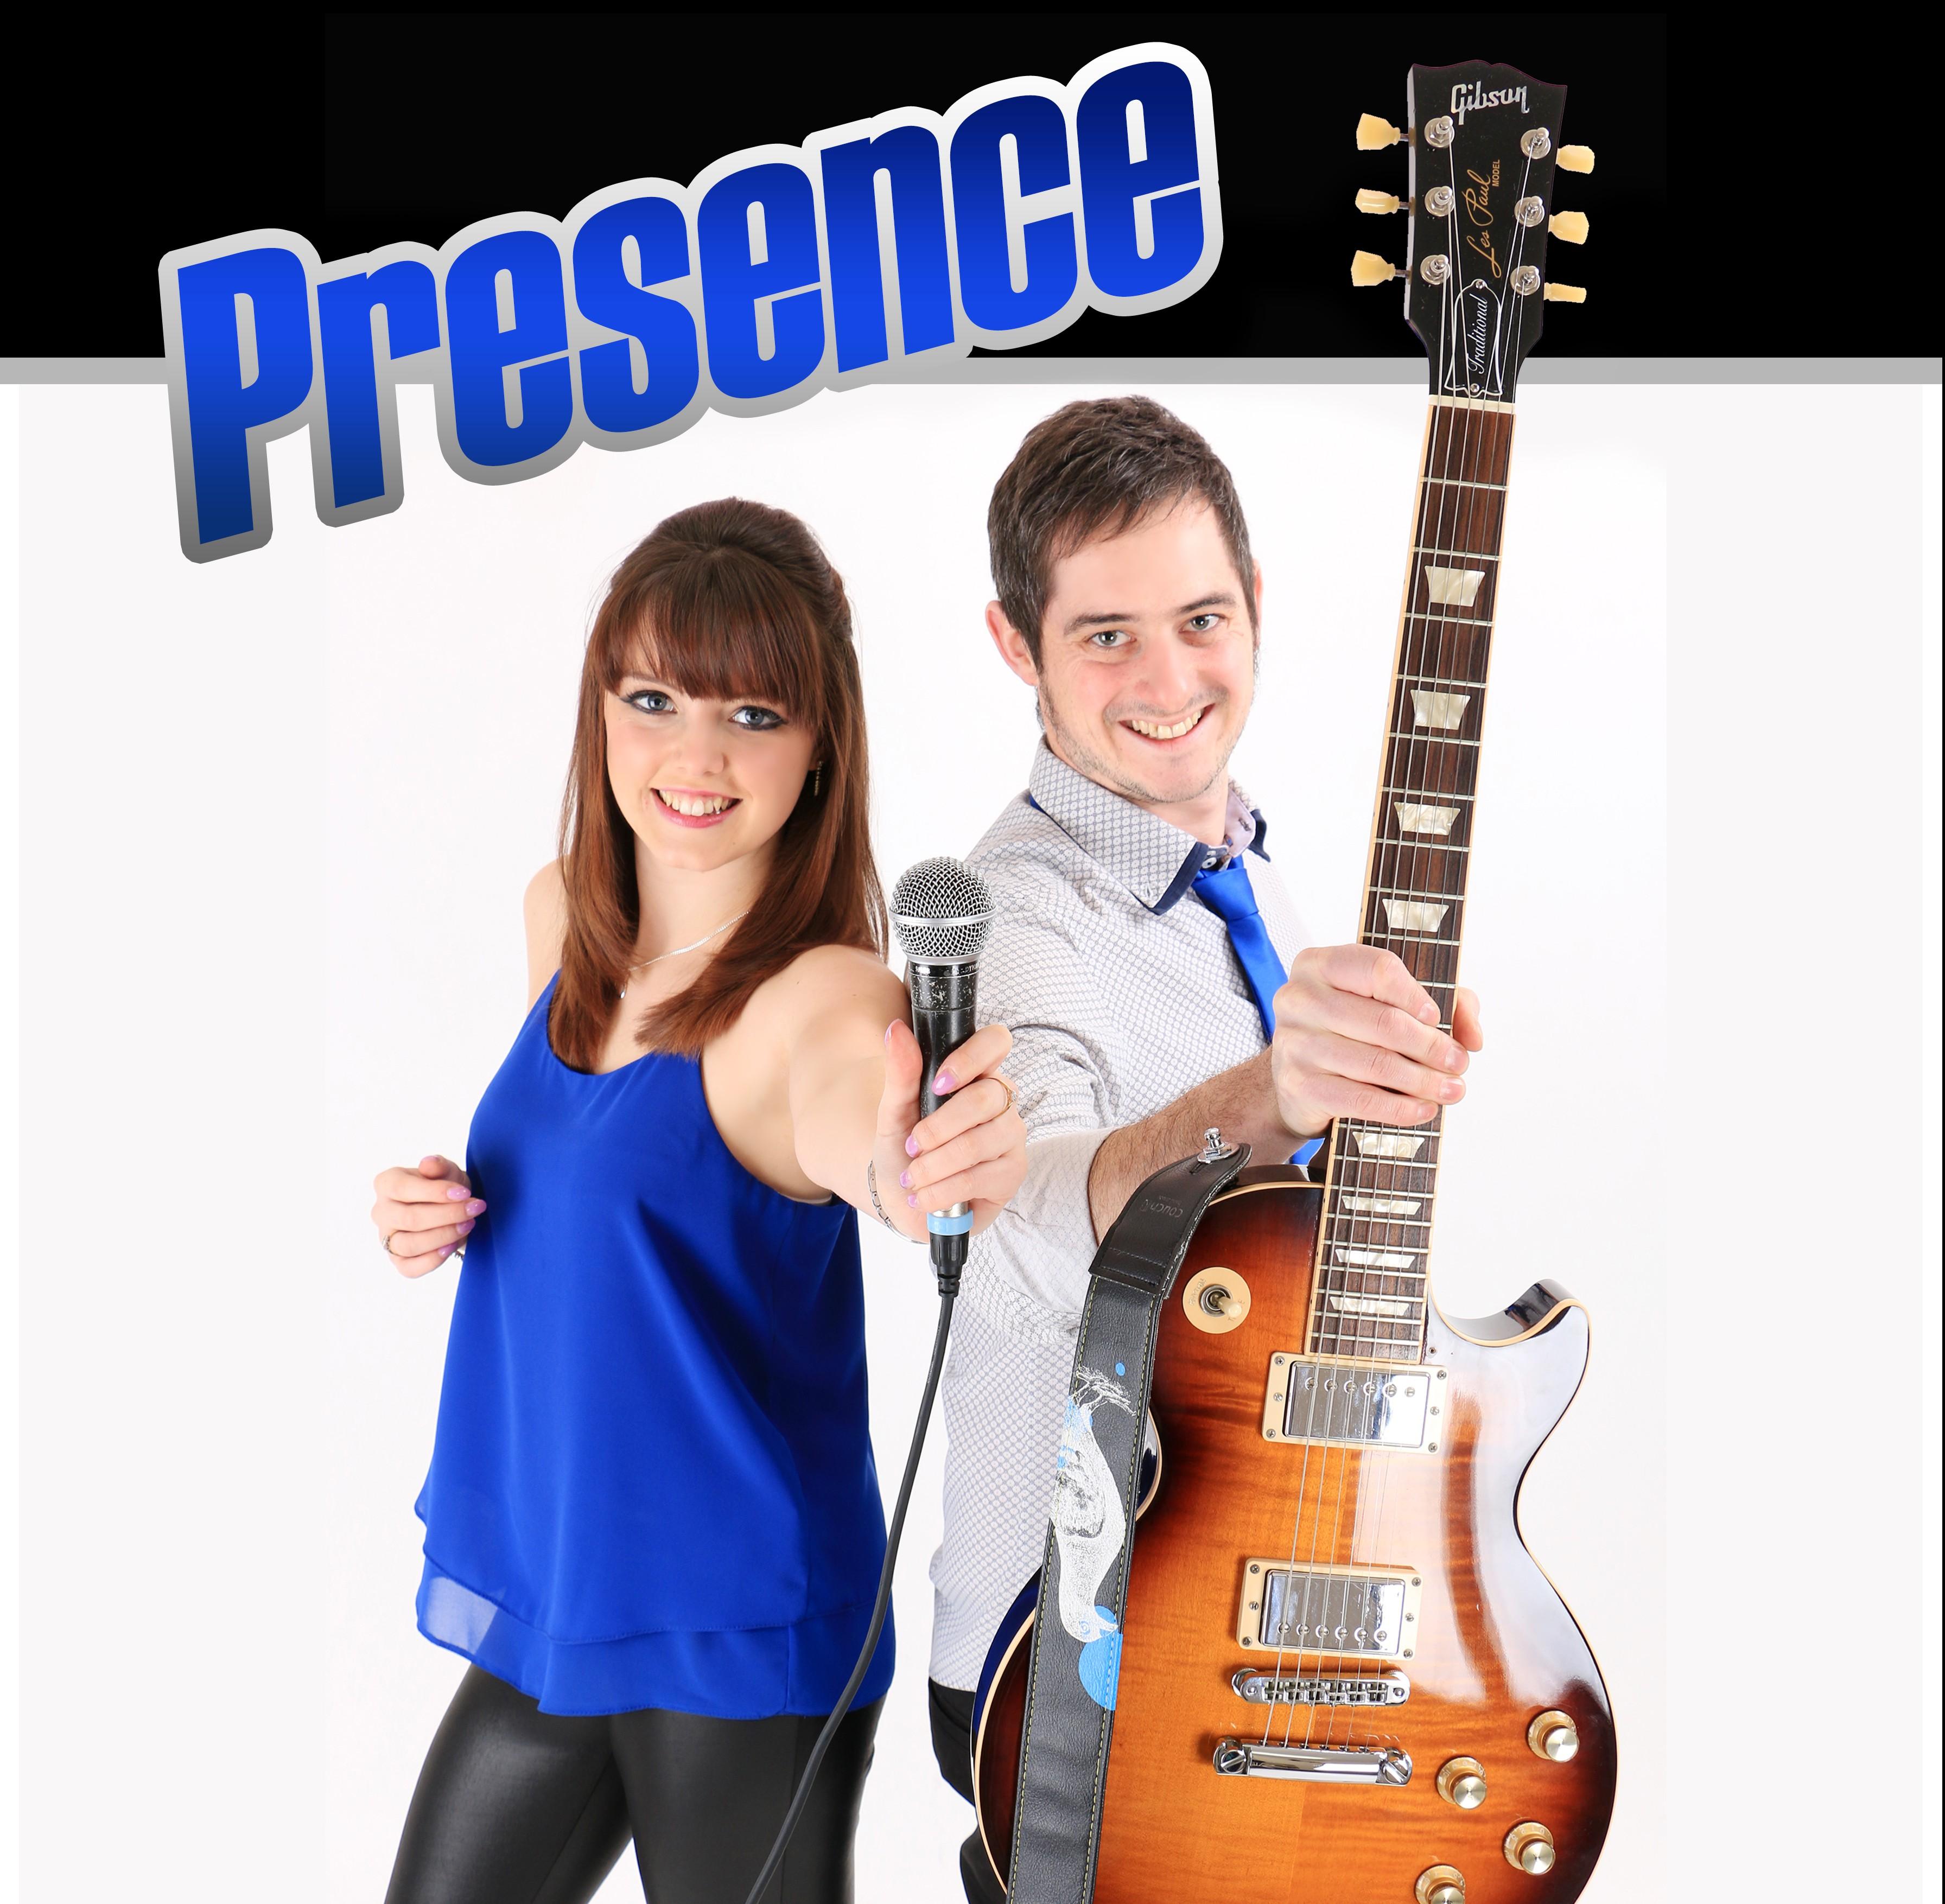 PRESENCE - A3 Poster